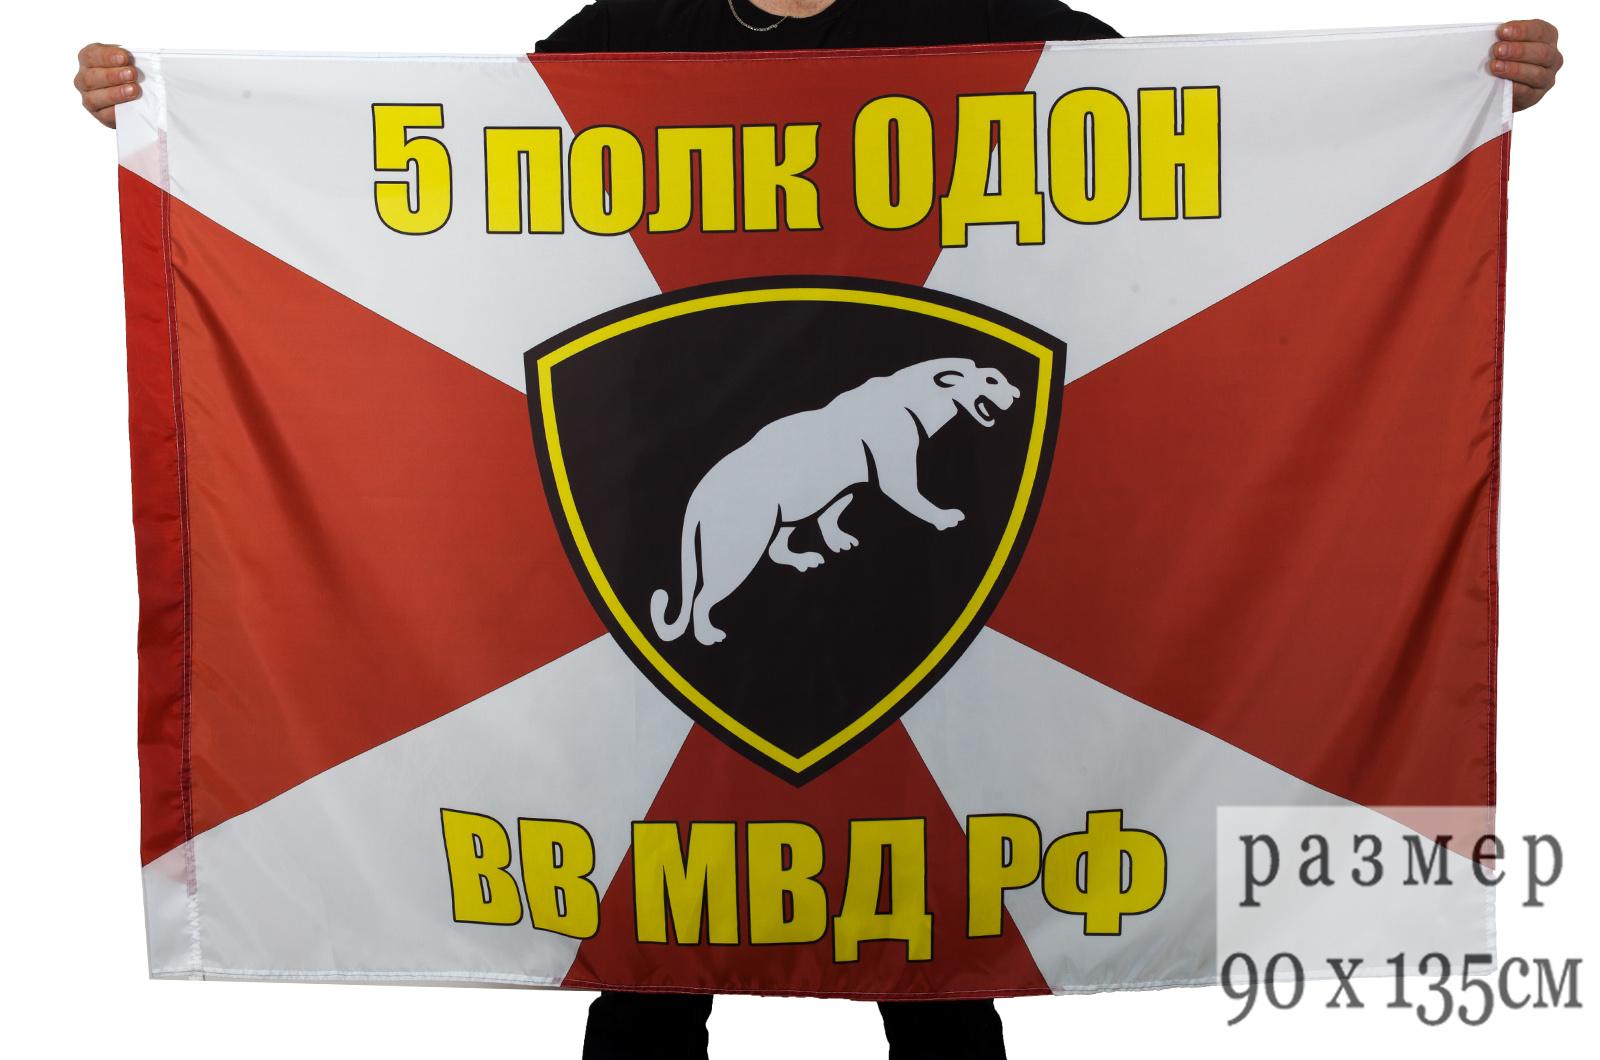 Флаг 5 полка ОДОН ВВ МВД РФ